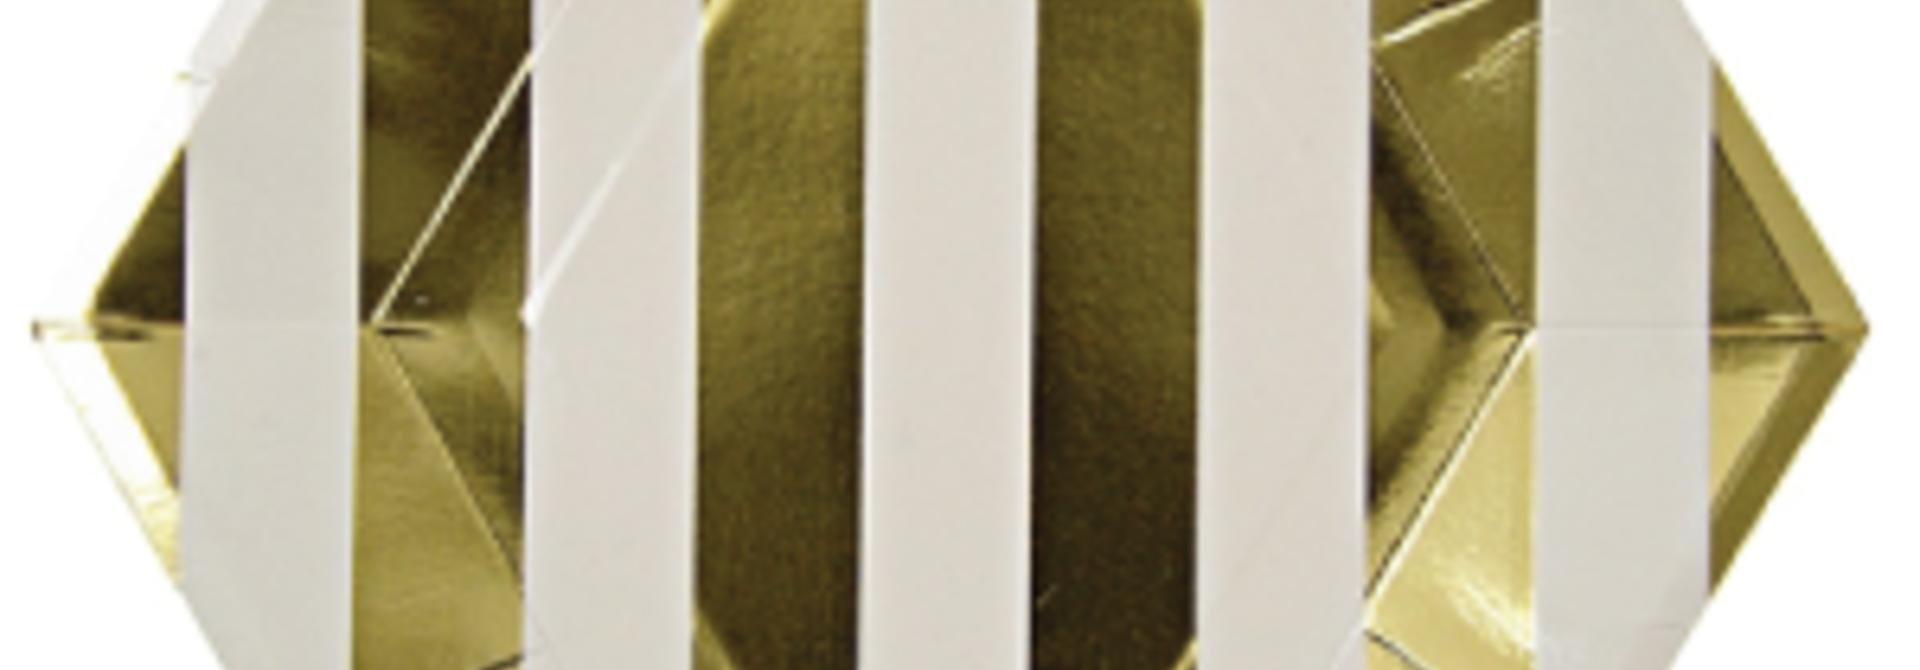 Gebaksbordjes goud gestreept (8st) Meri Meri